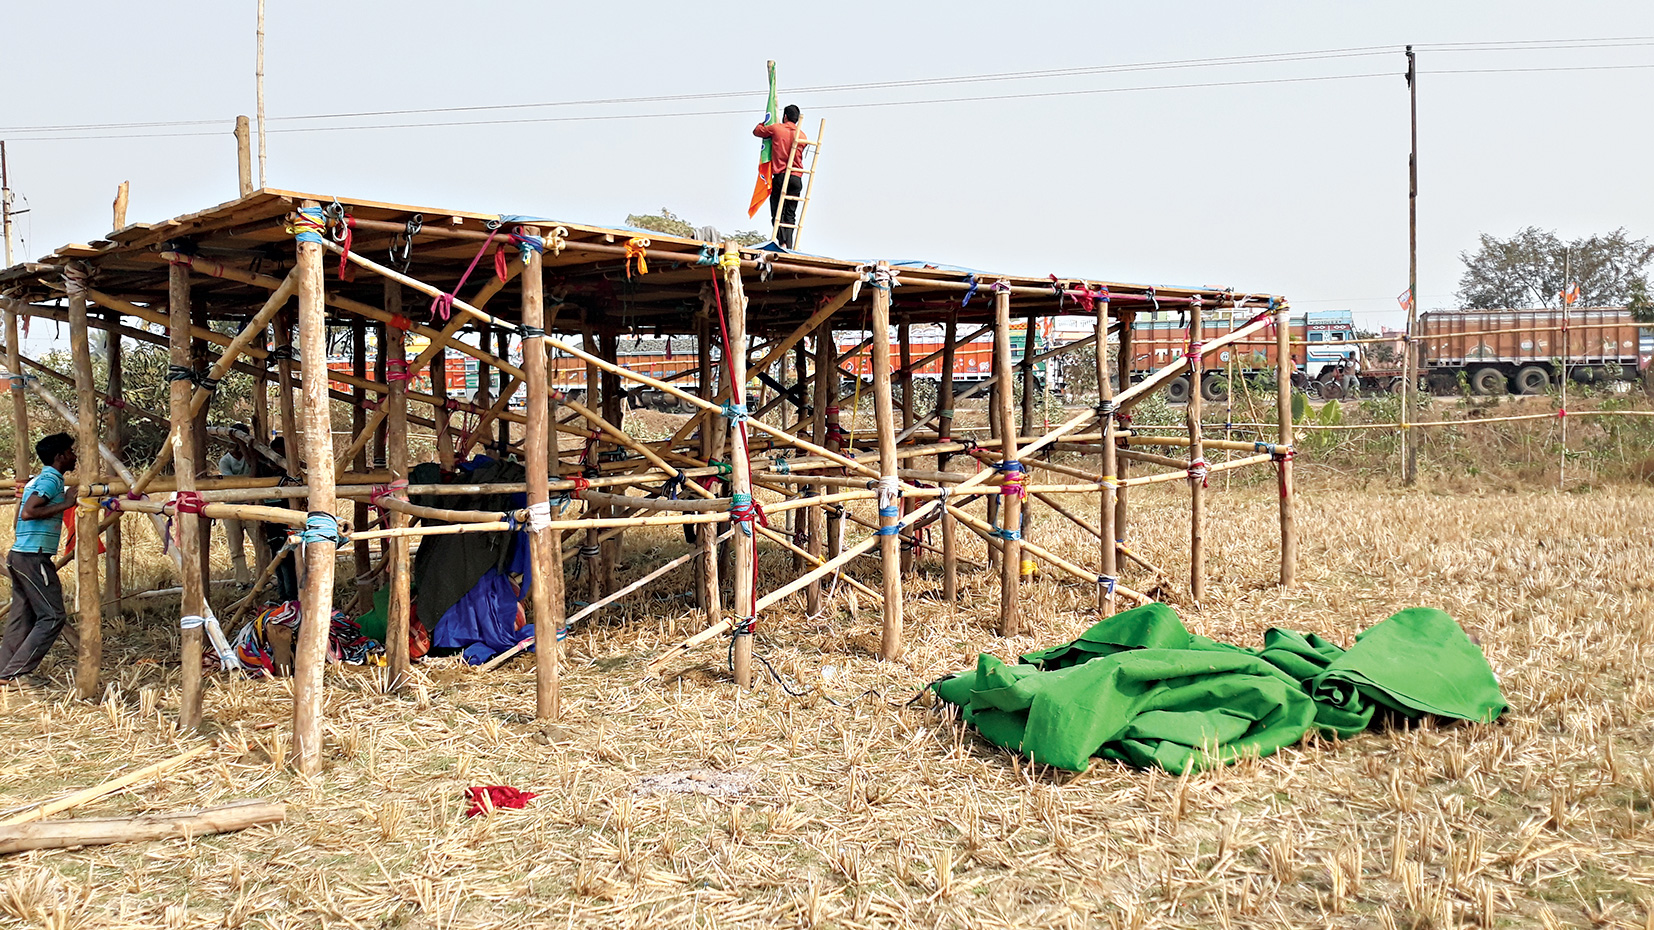 Green carpet near the BJP rally site in Suri.